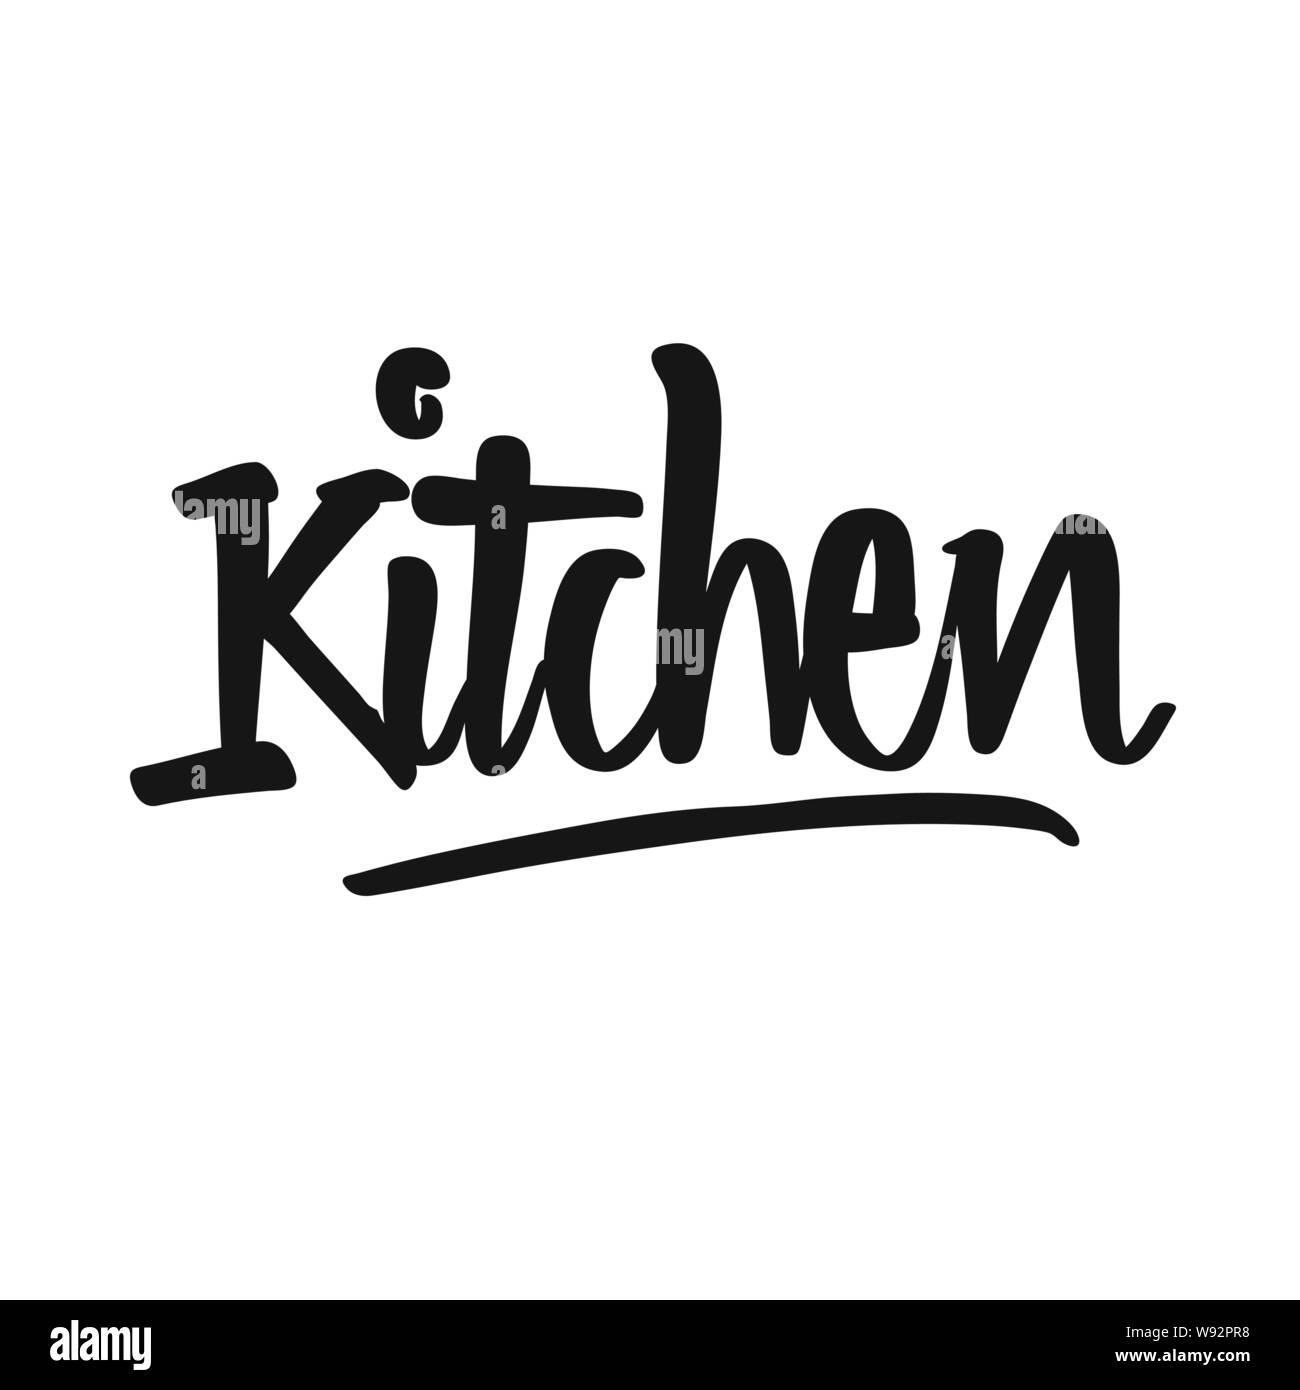 graphic regarding Printable Kitchen Art titled Kitchen area handwritten lettering. Printable Kitchen area artwork indicator